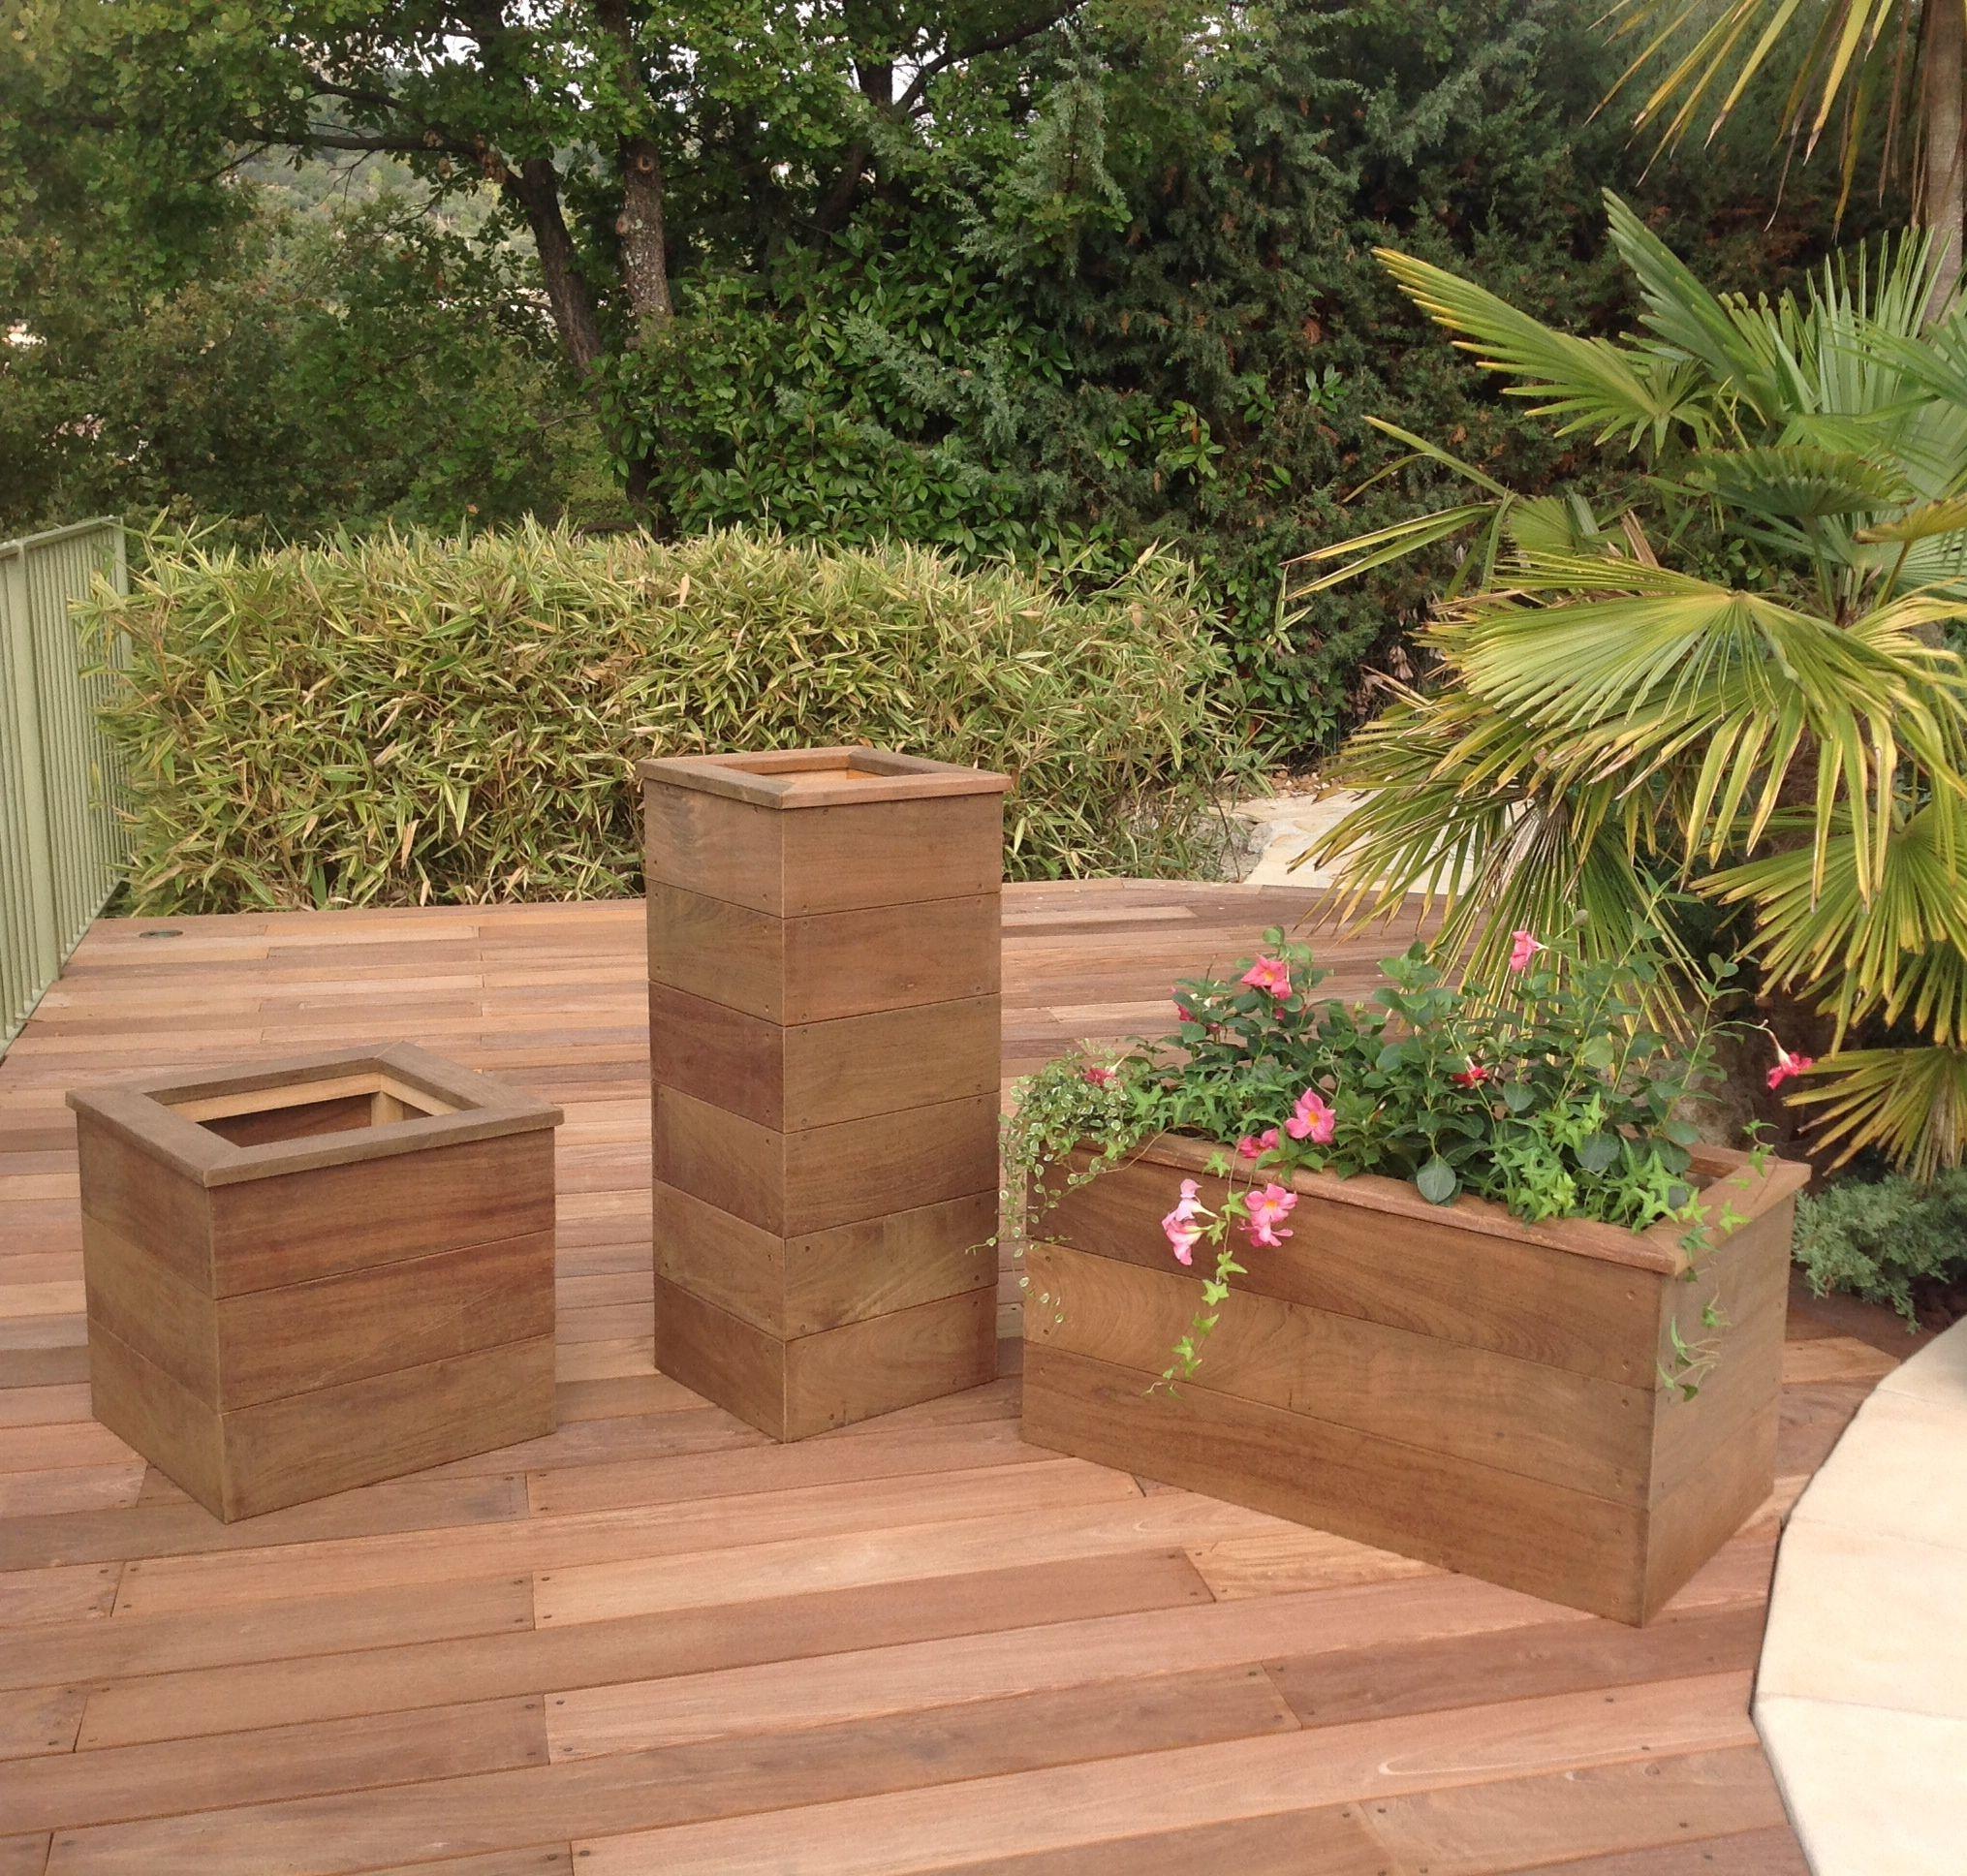 jardini re herbes aromatiques potager douglas bois. Black Bedroom Furniture Sets. Home Design Ideas